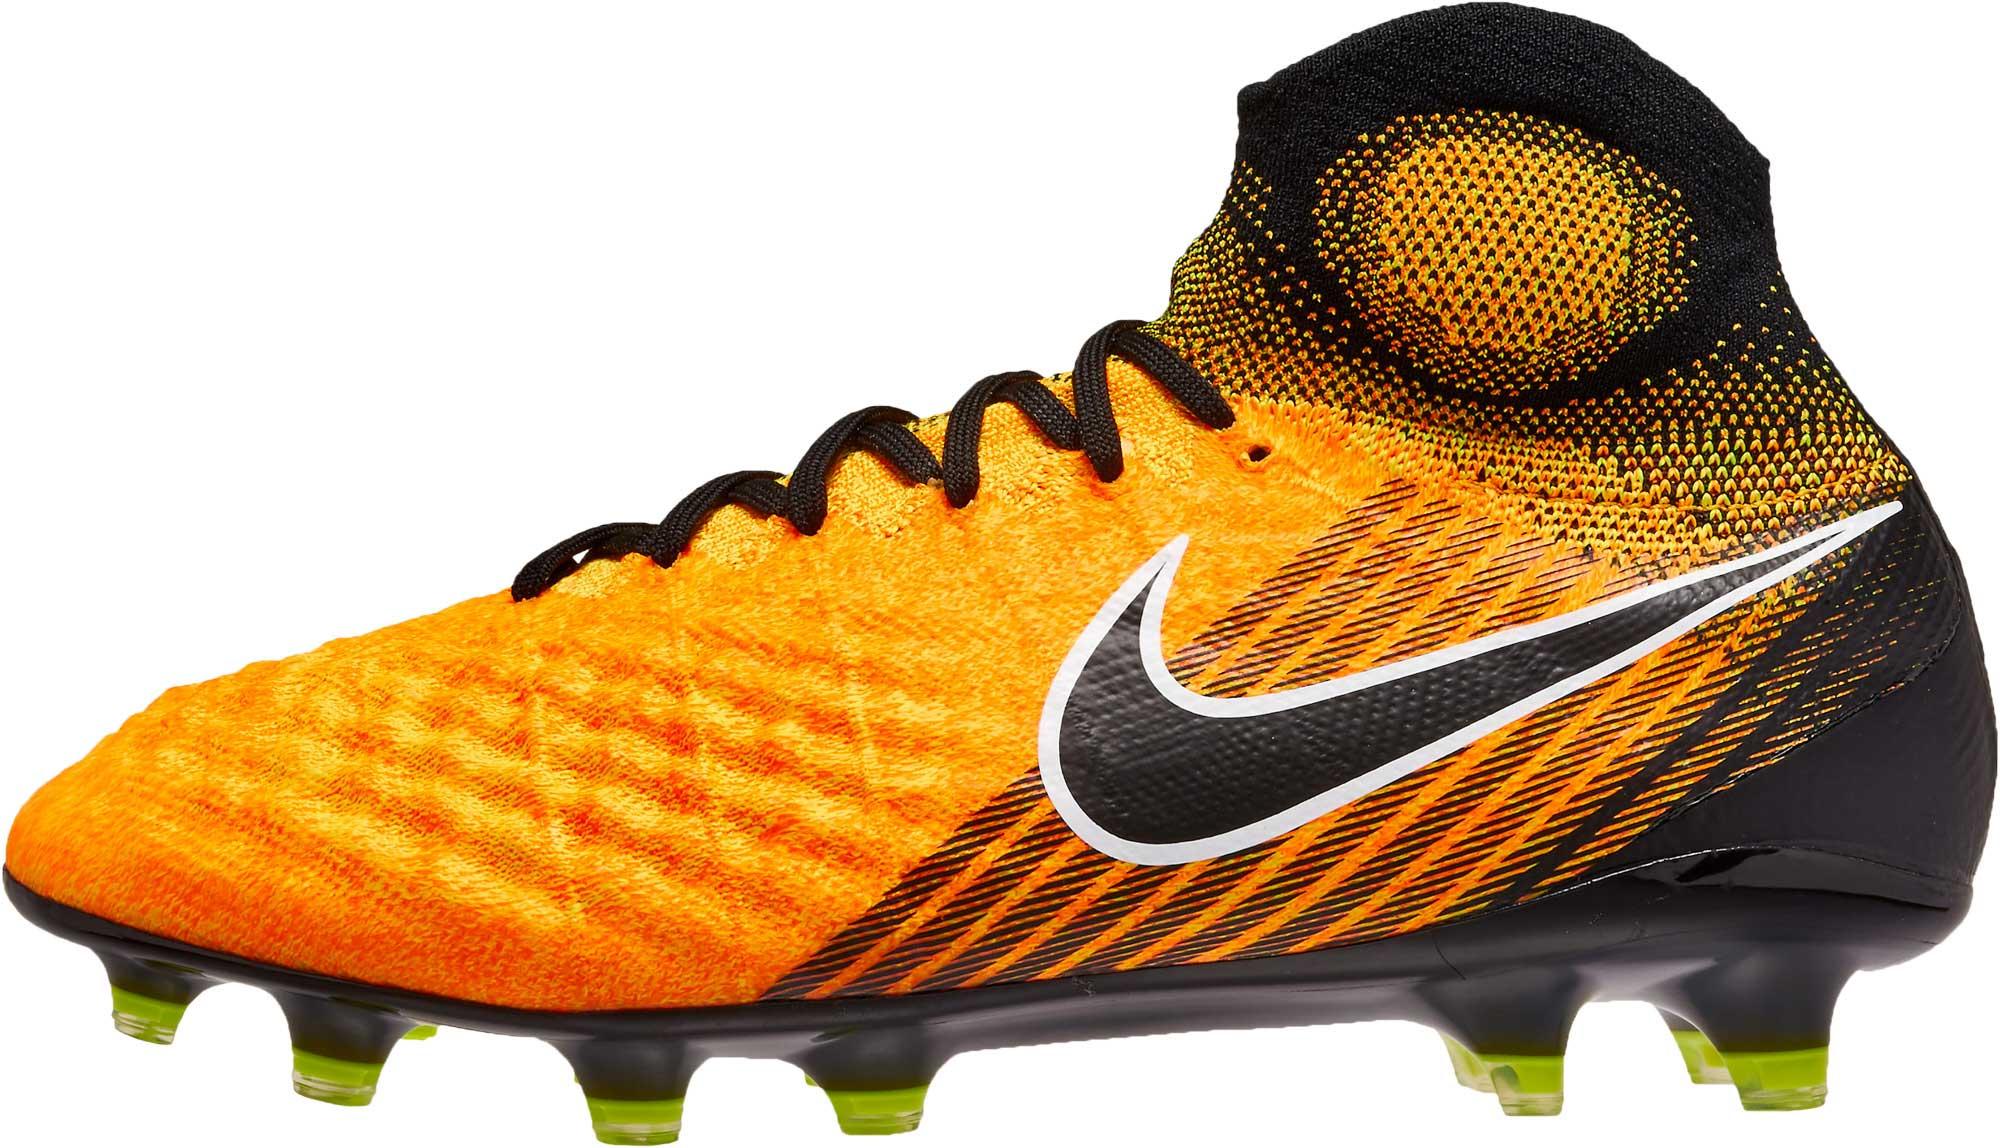 finest selection 3b09a 8e578 Nike Magista Obra II FG Soccer Cleats - Laser Orange   Black ...